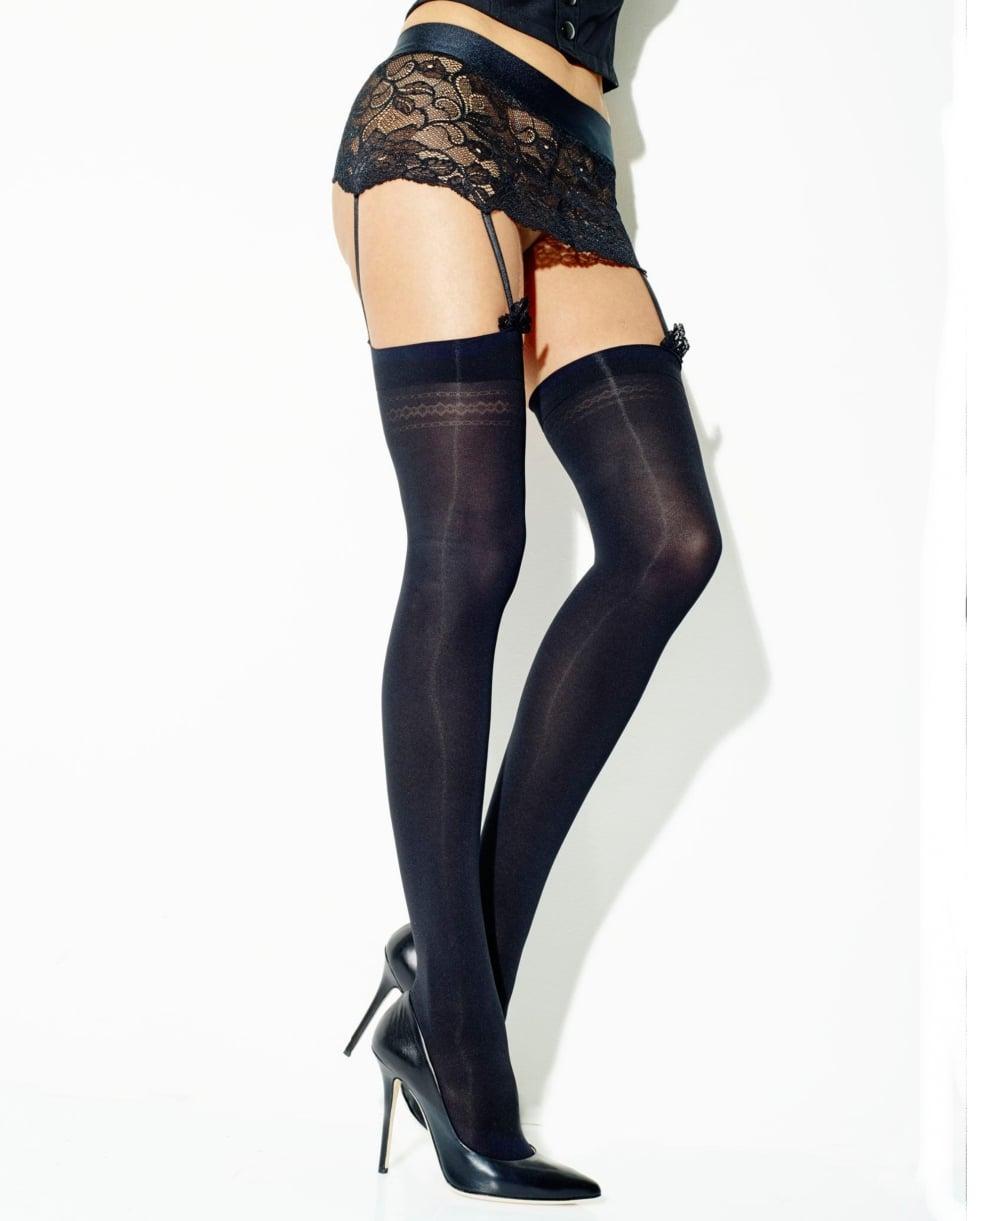 Girardi Seduire Stockings and Suspender Set - Stockings